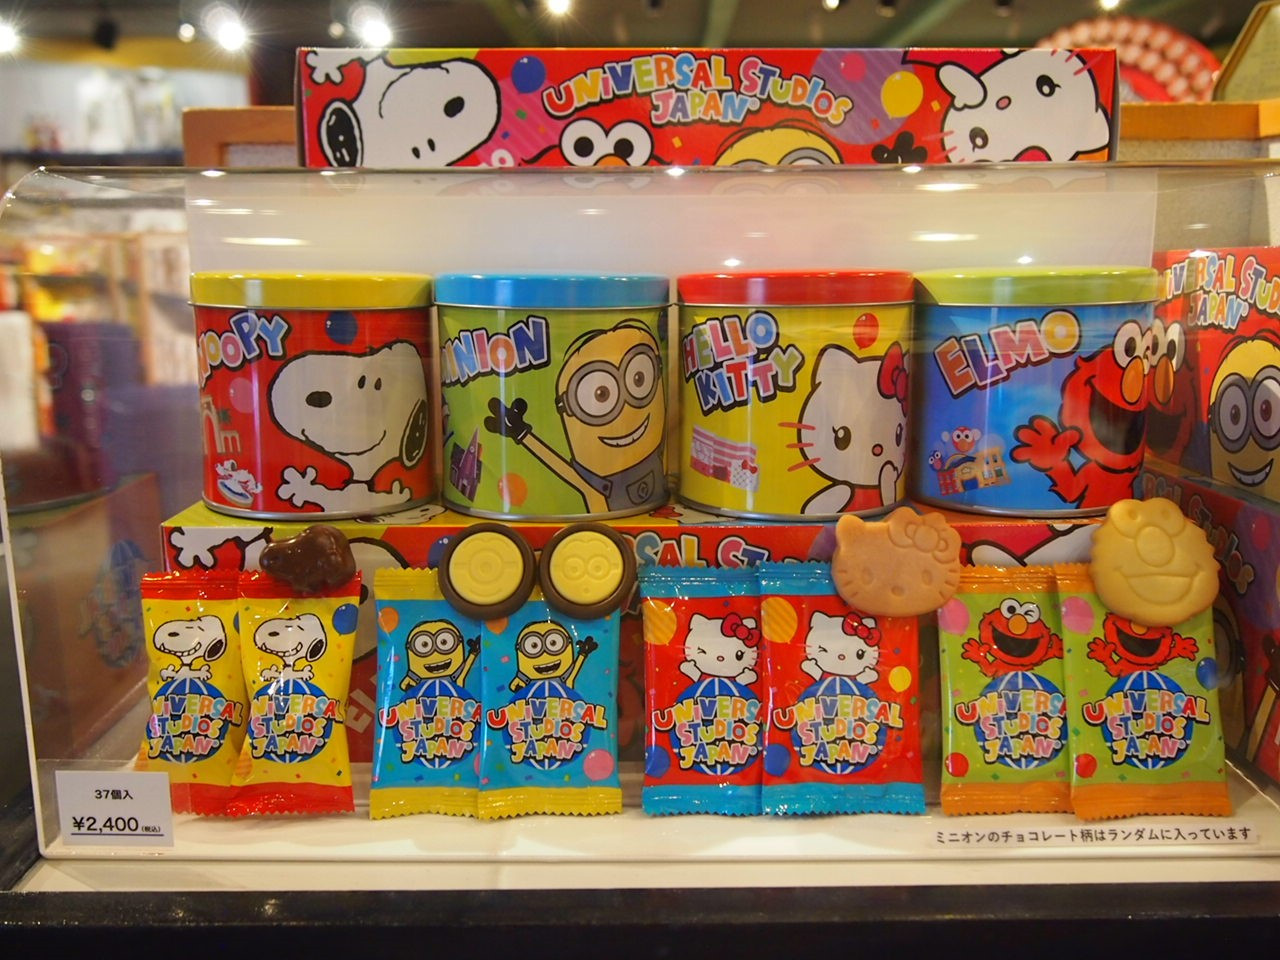 USJミニオン・キティ・スヌーピー・エルモ4缶セット